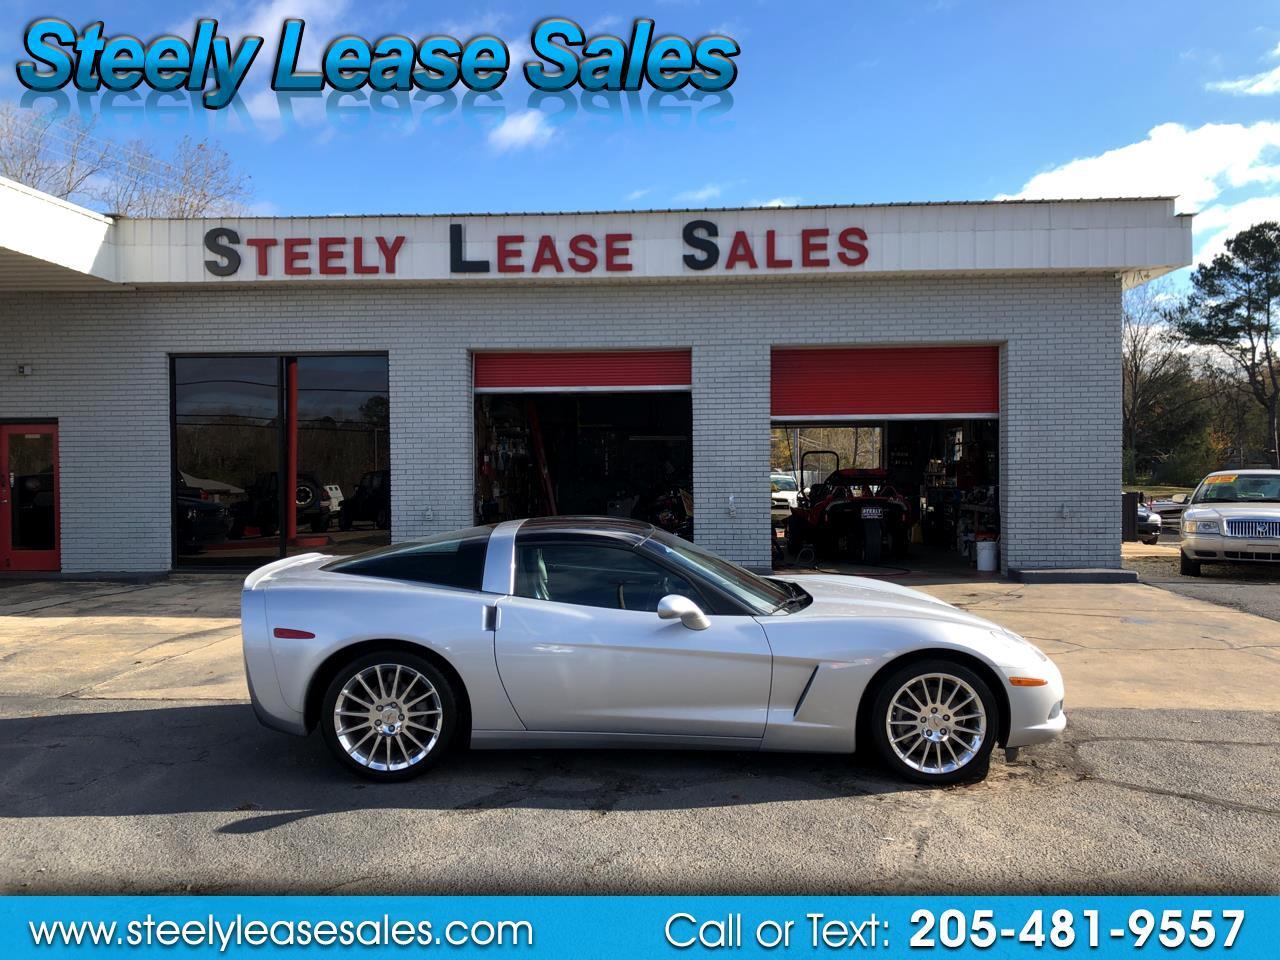 2010 Chevrolet Corvette 2dr Cpe w/1LT